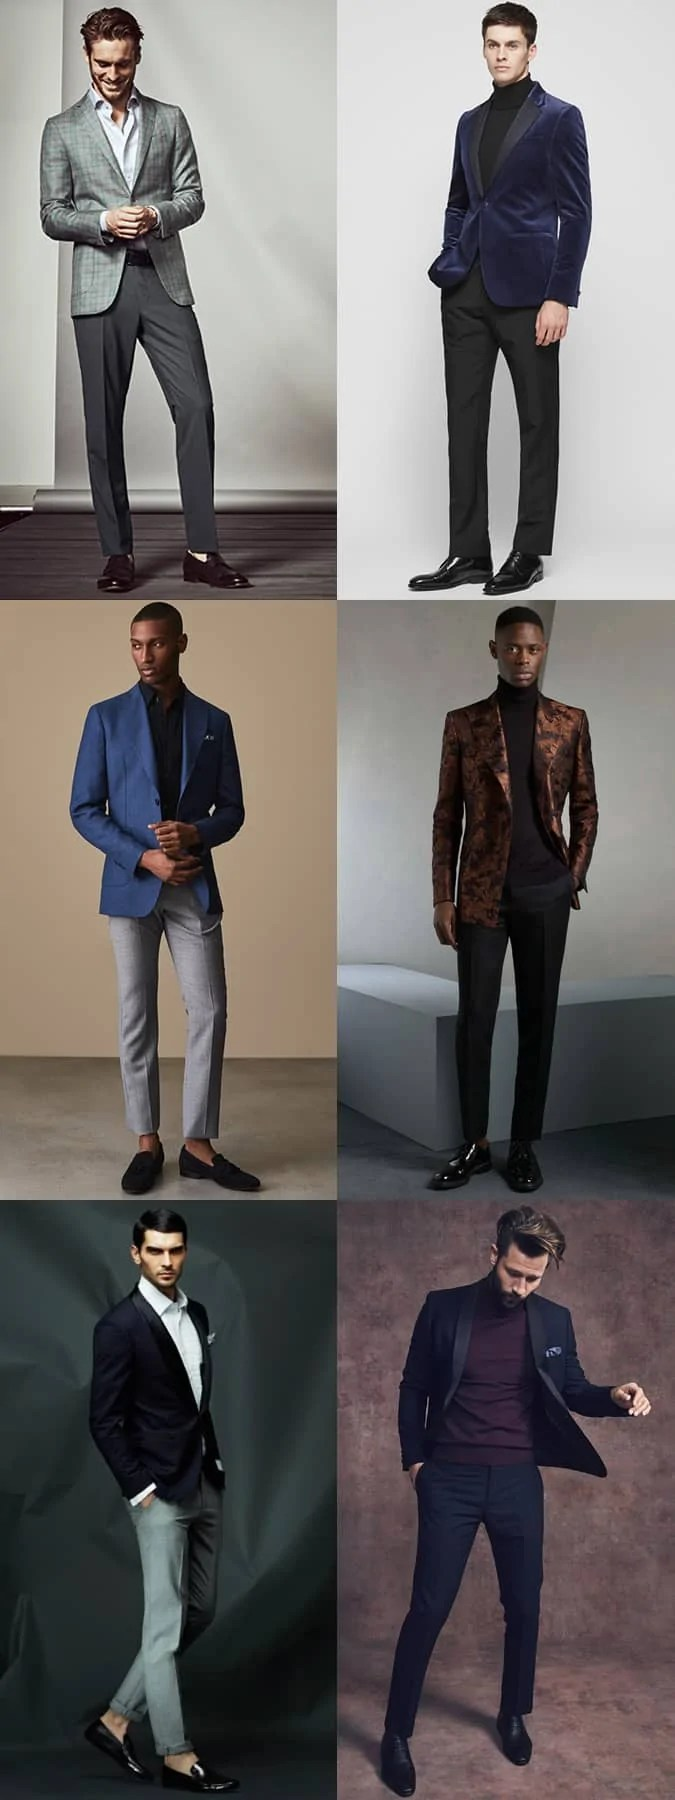 Men's Cocktail Attire Outfit Inspiration